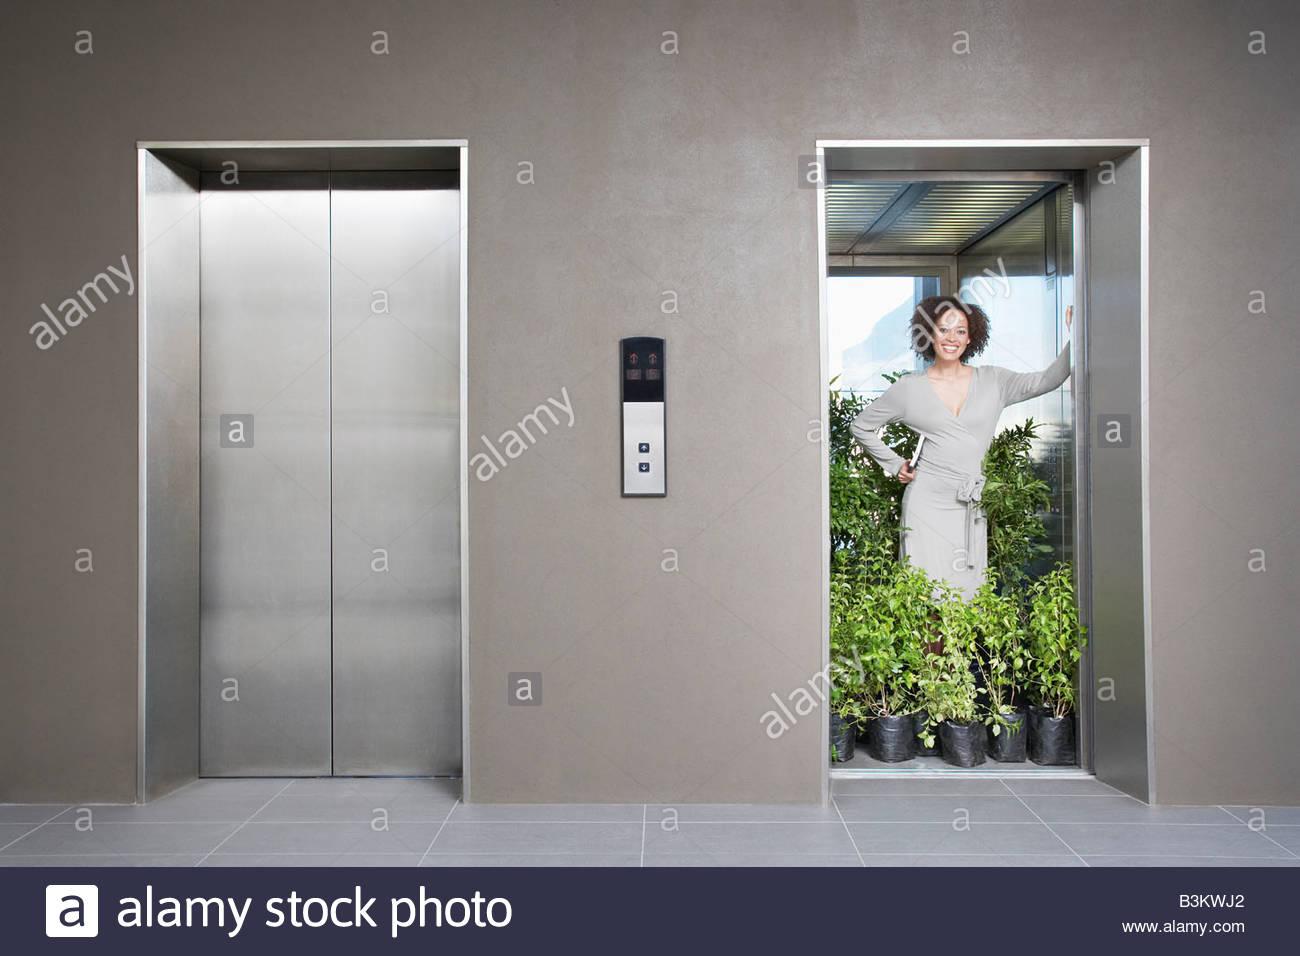 Businesswoman in elevator full of plants - Stock Image